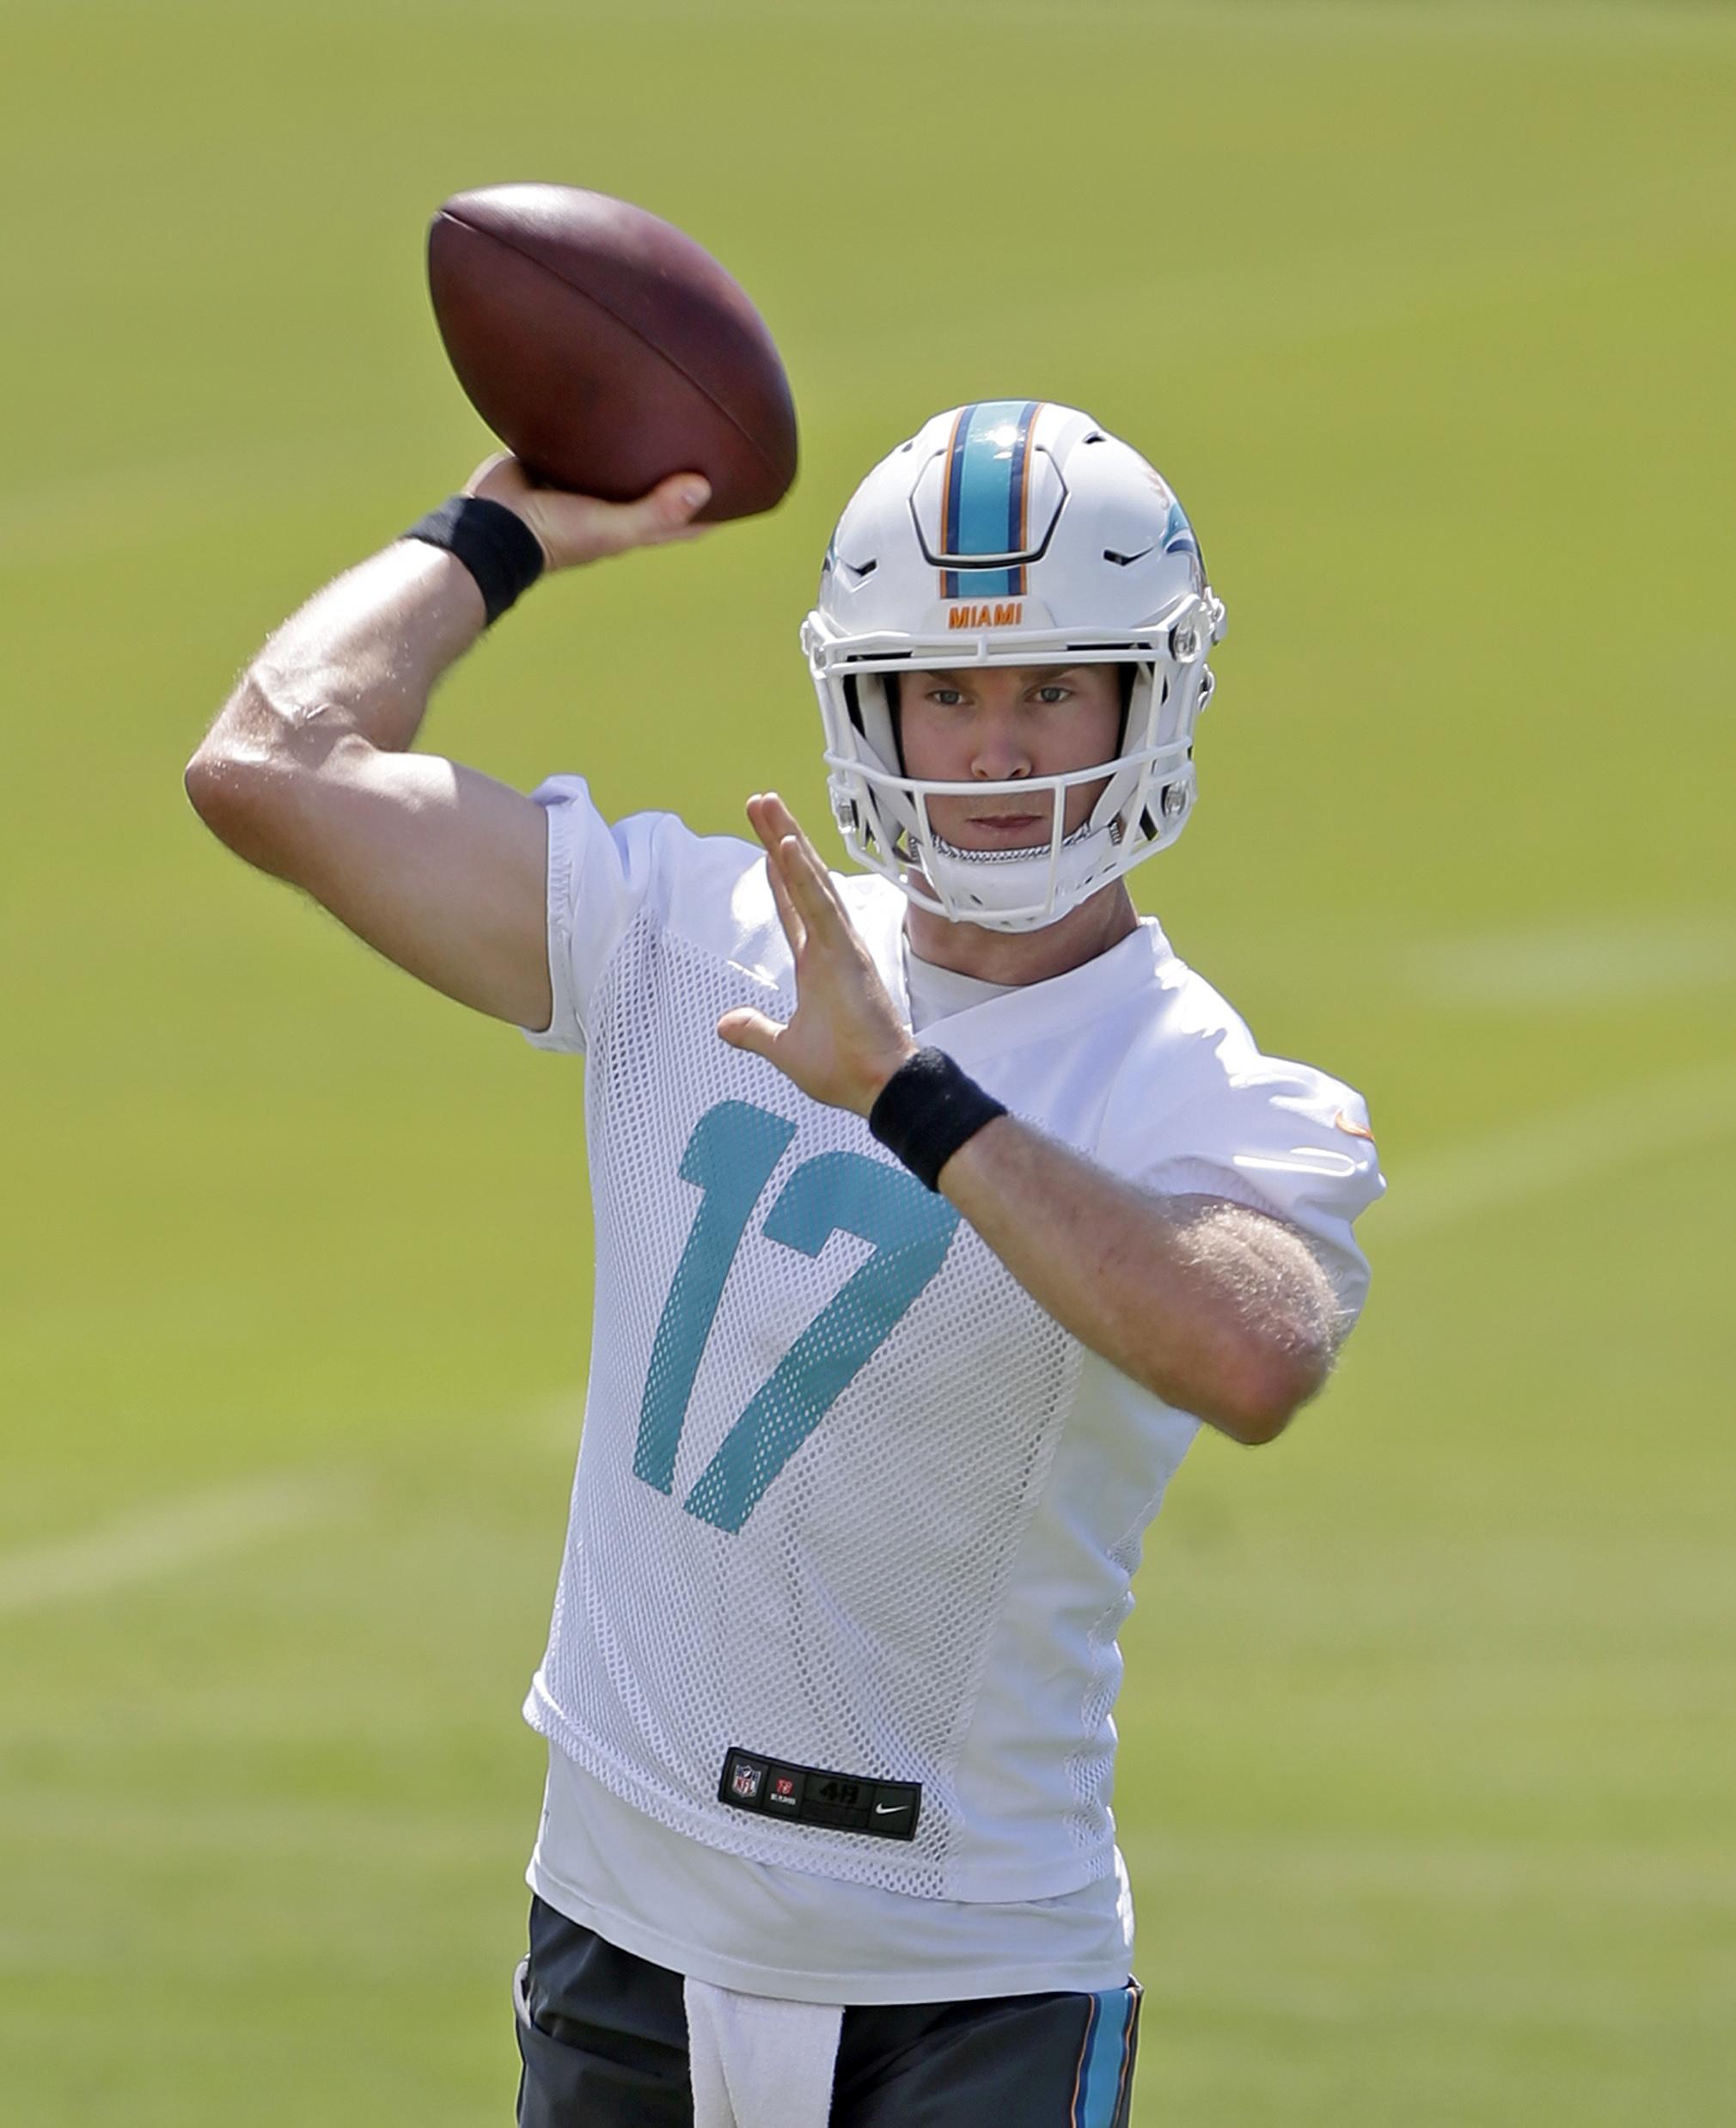 Miami Dolphins quarterback Ryan Tannehill prepares to pass during an NFL football practice Thursday, May 26, 2016, in Davie, Fla.  (AP Photo/Alan Diaz)